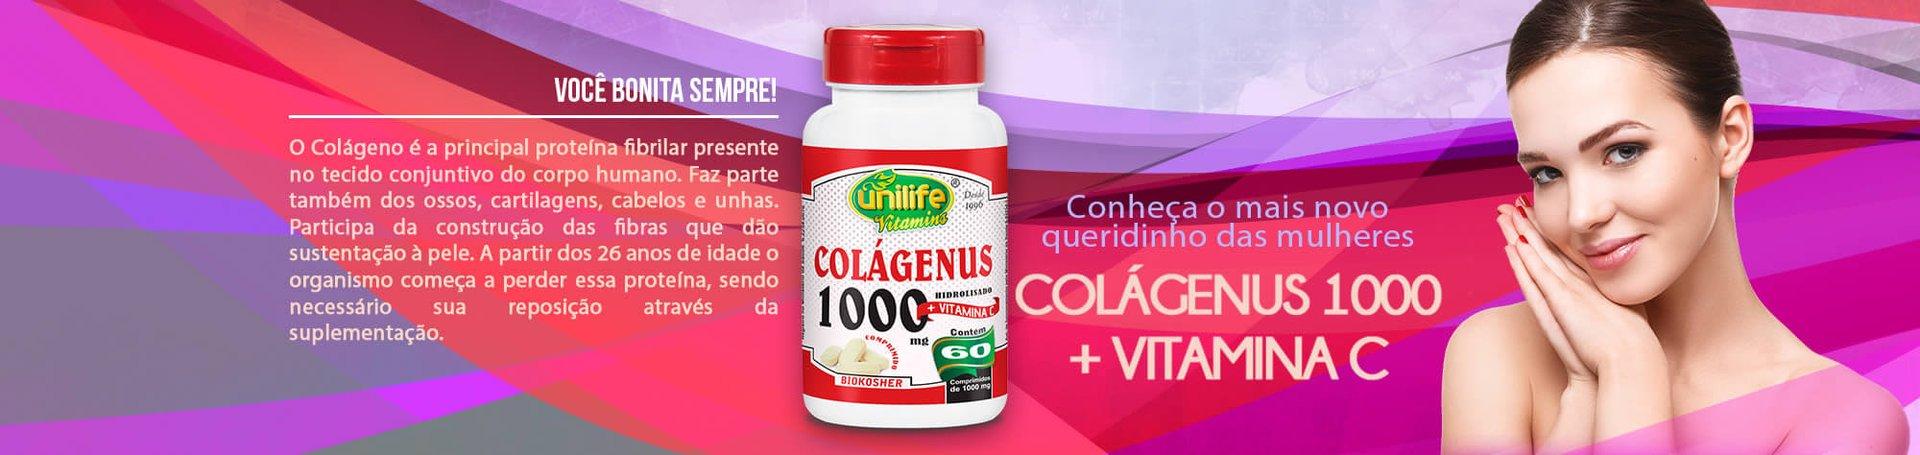 Colageno 120 capsulas + Vitamina C Loja Folha Verde